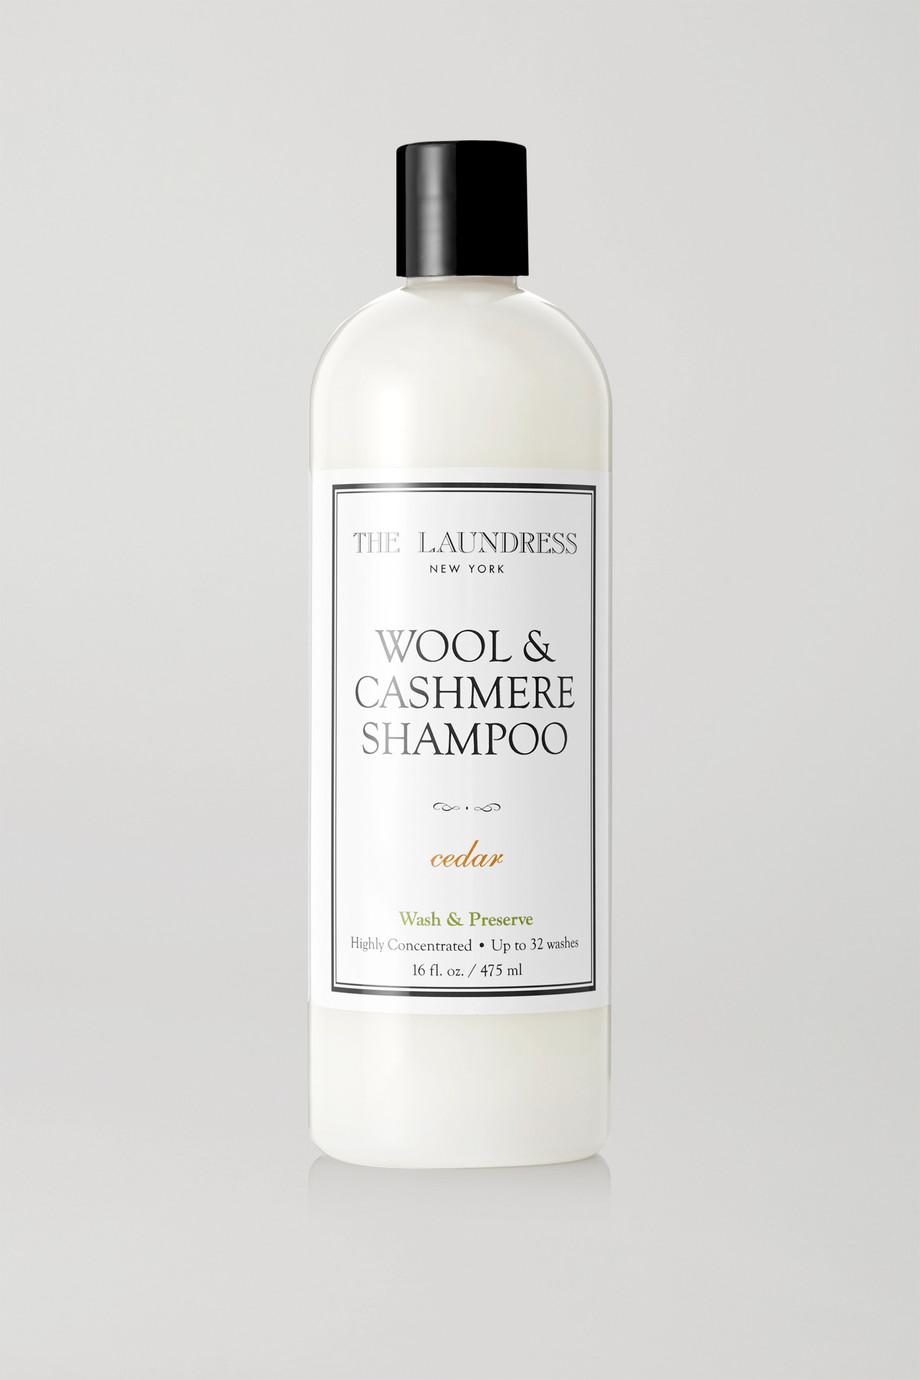 The Laundress 羊毛和羊绒衣物护理液 - 雪松,475ml